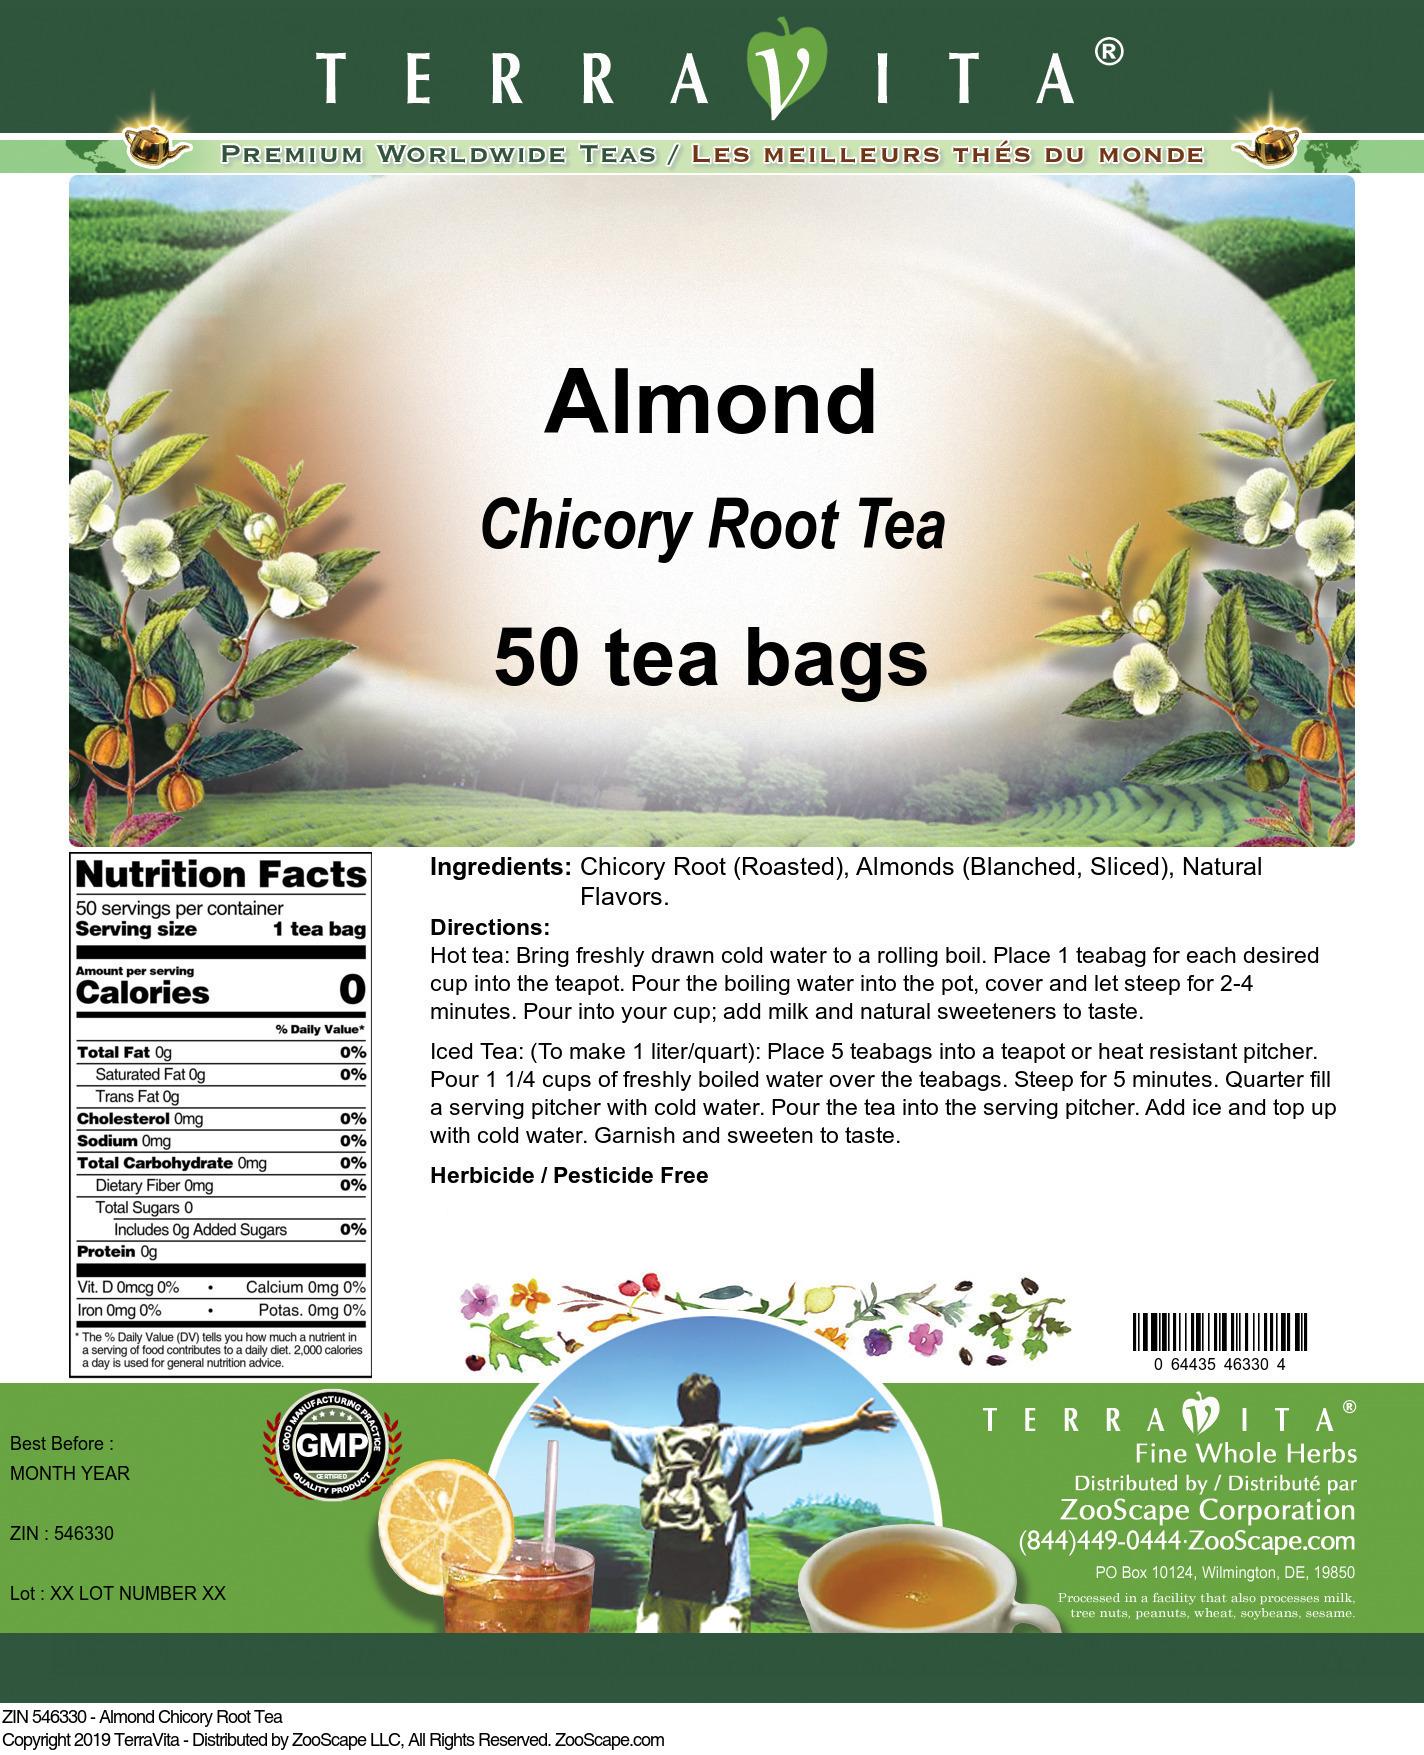 Almond Chicory Root Tea